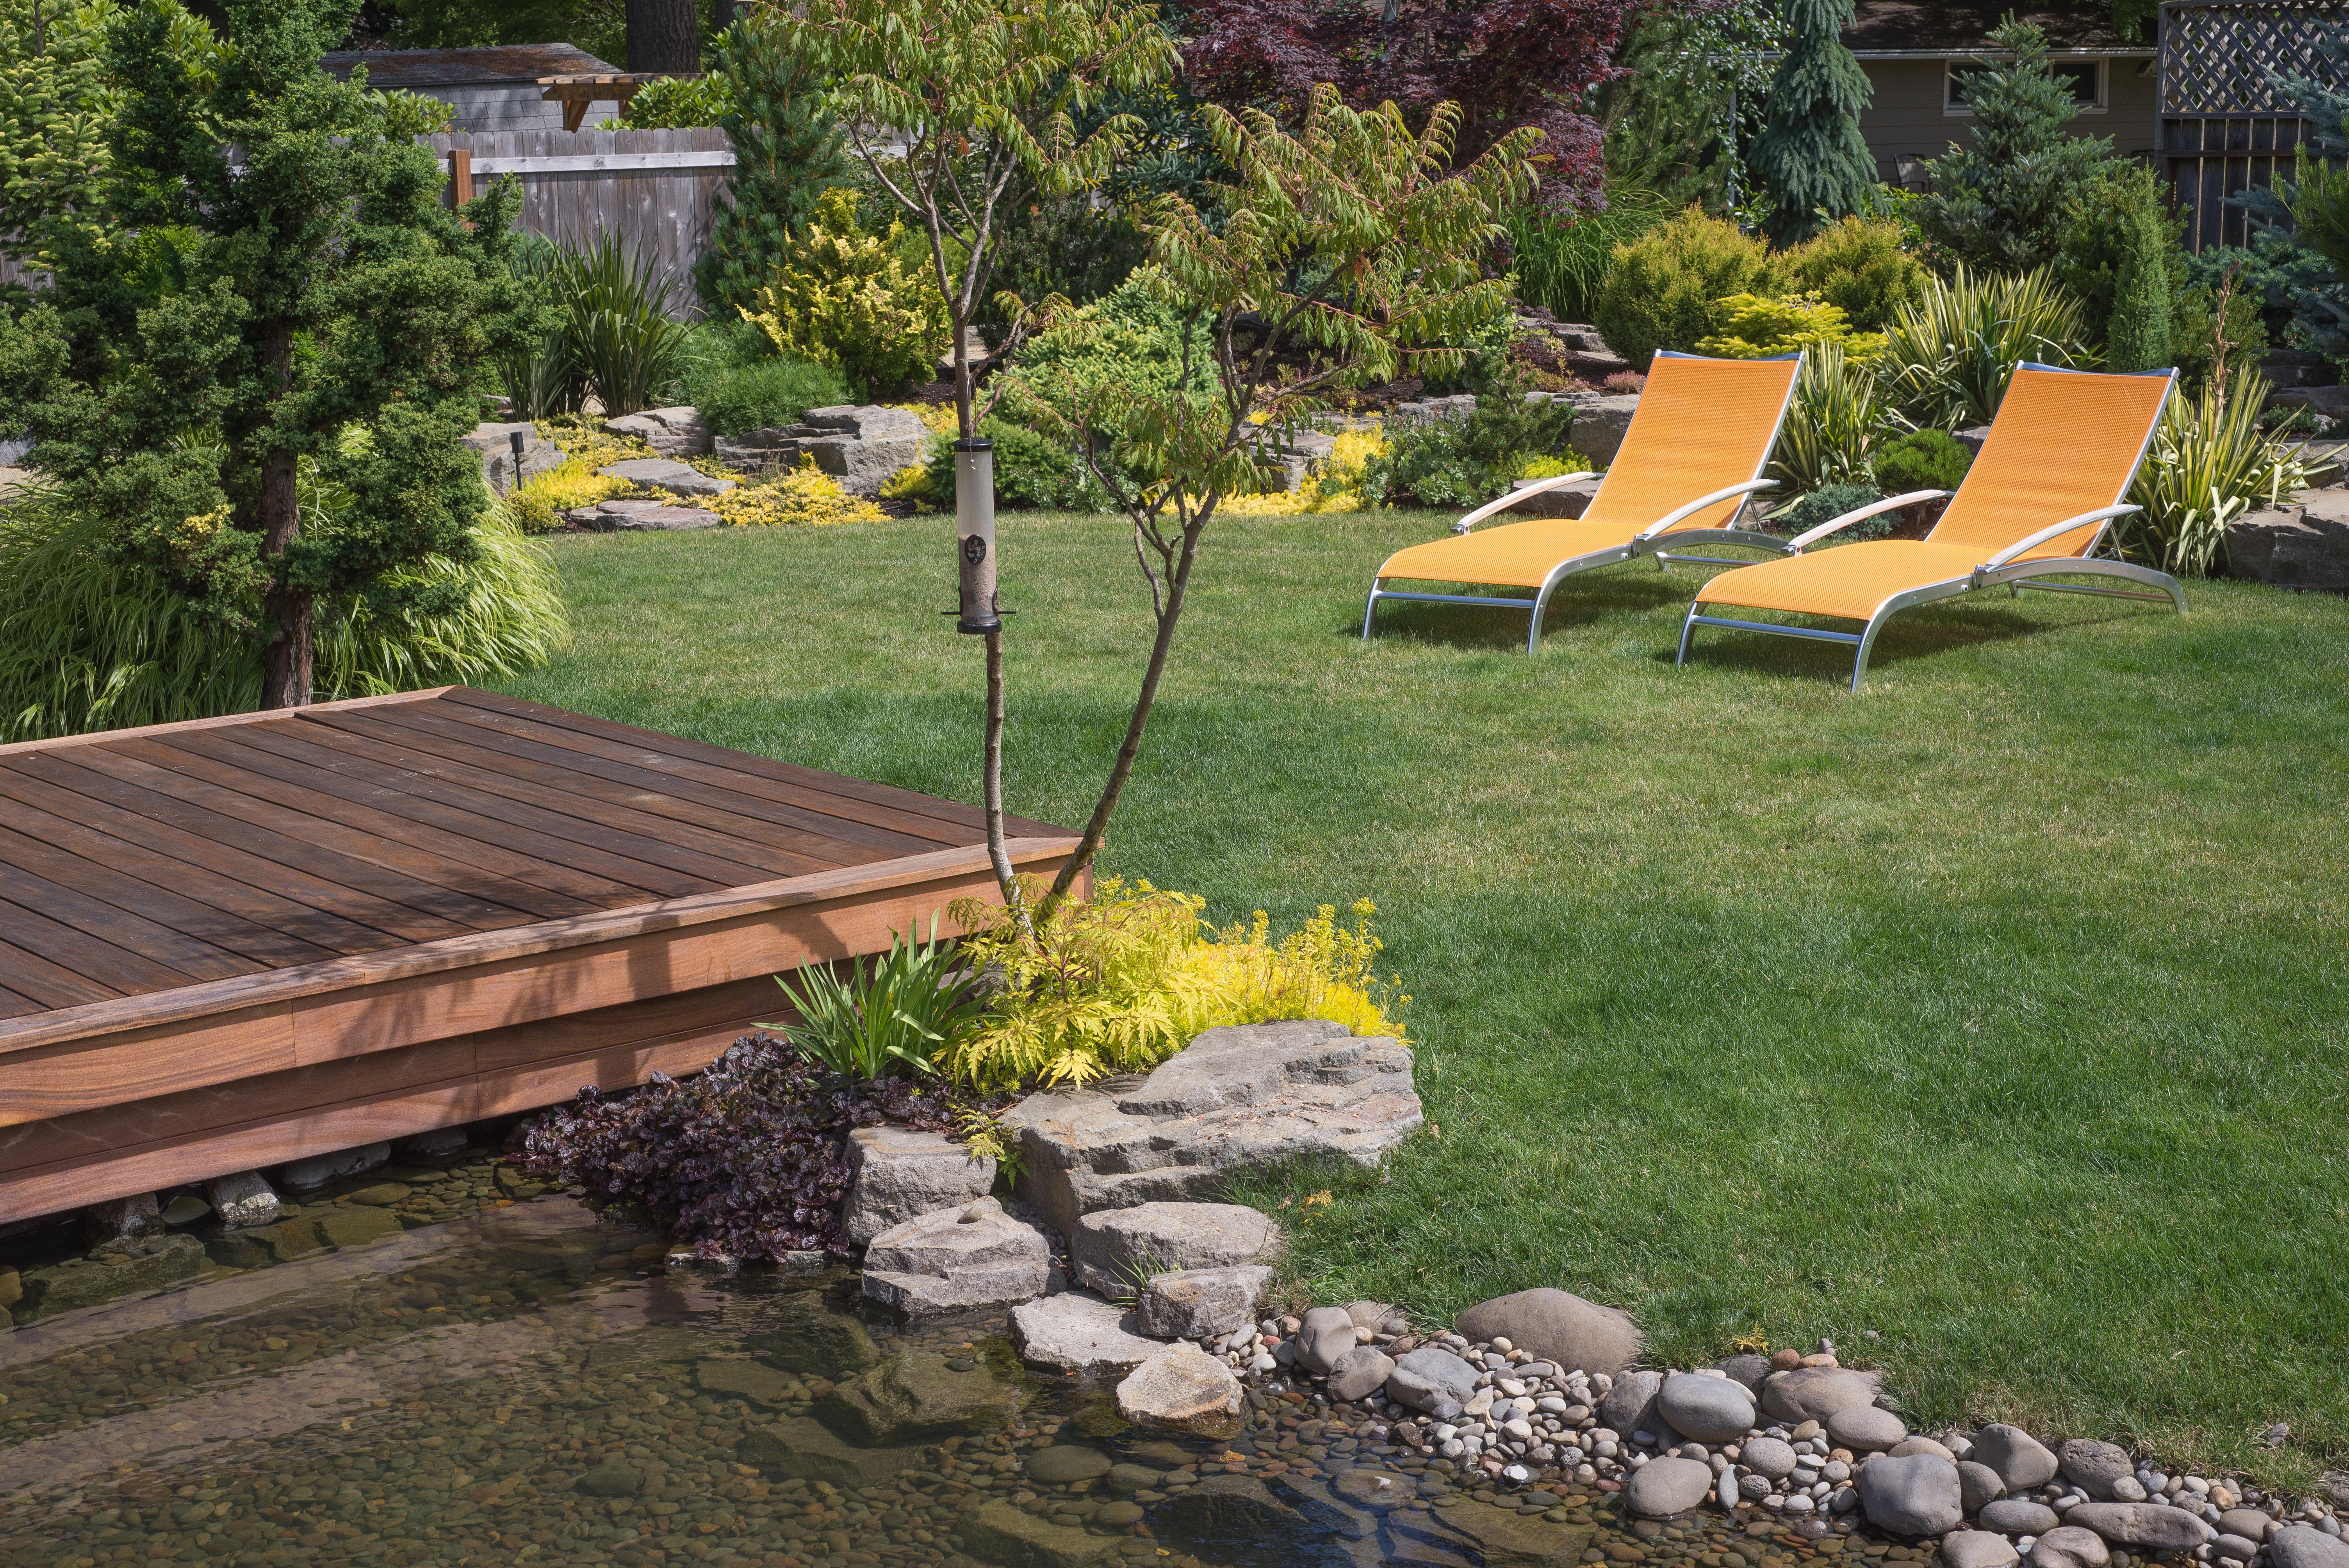 Bassin ornement et jardin